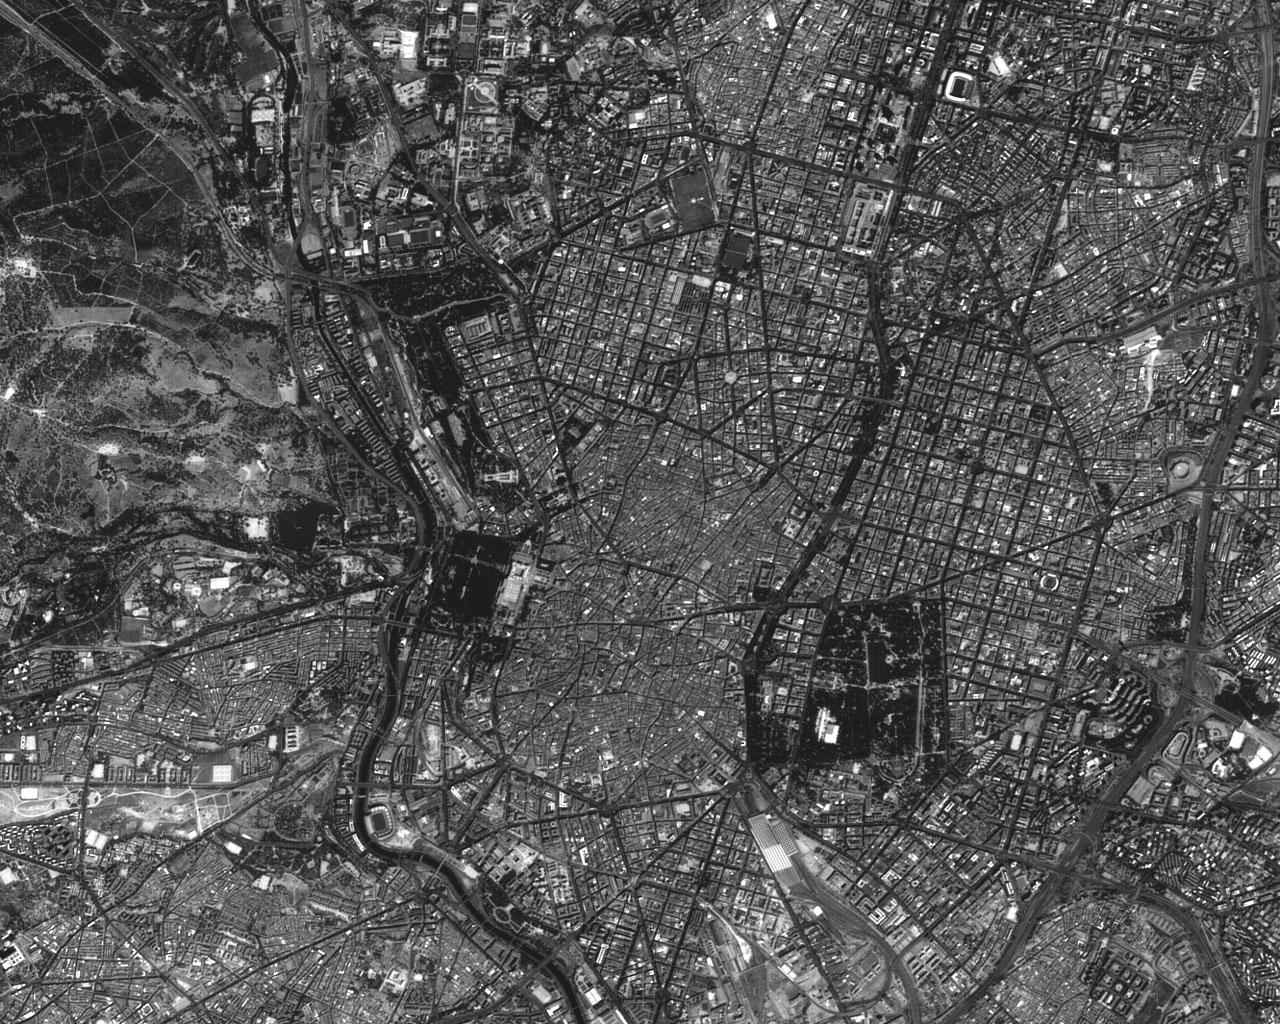 Satellite image of downtown Madrid 2001